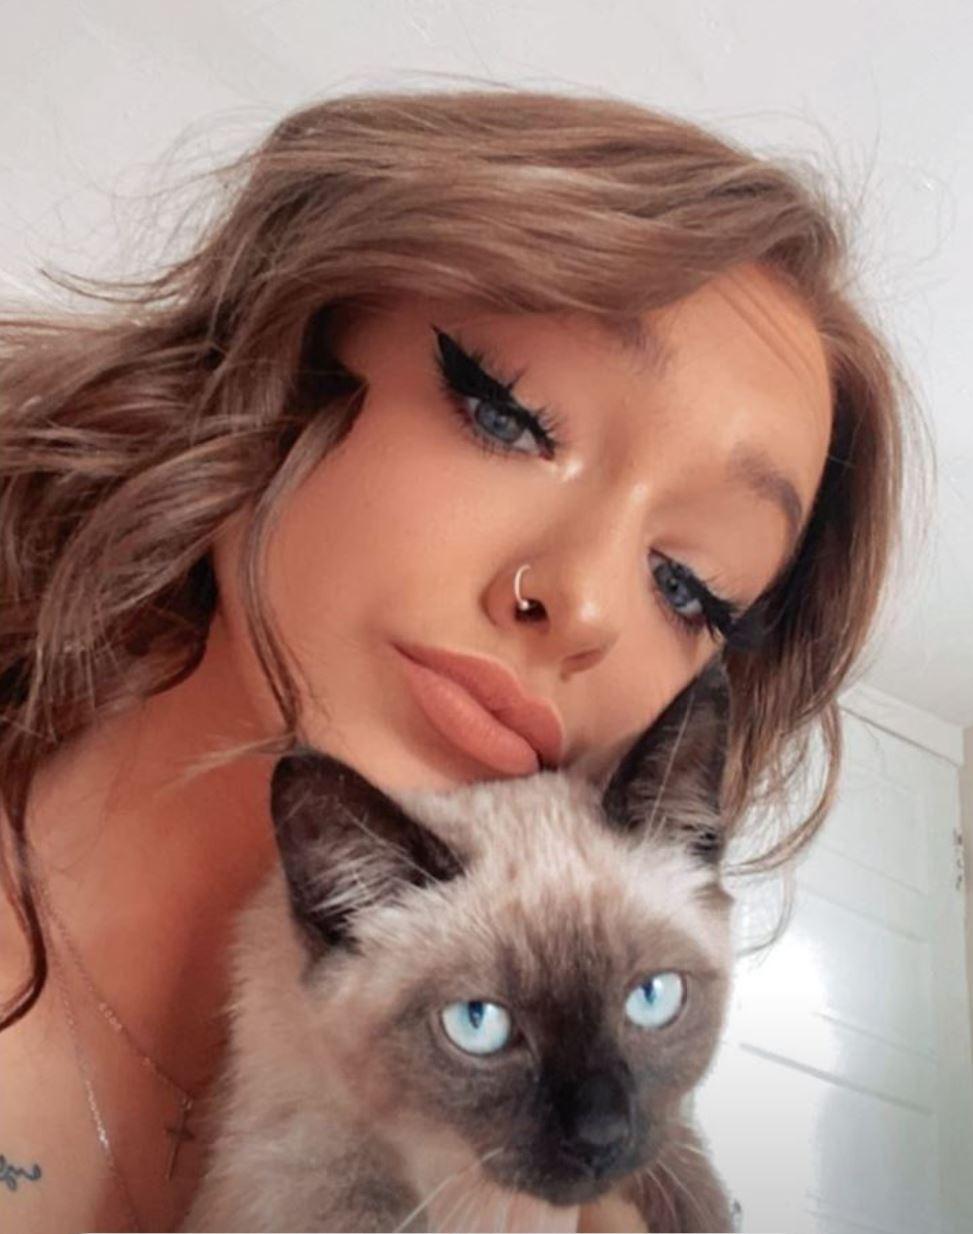 Zoe Laverne cuddles her pet kitten